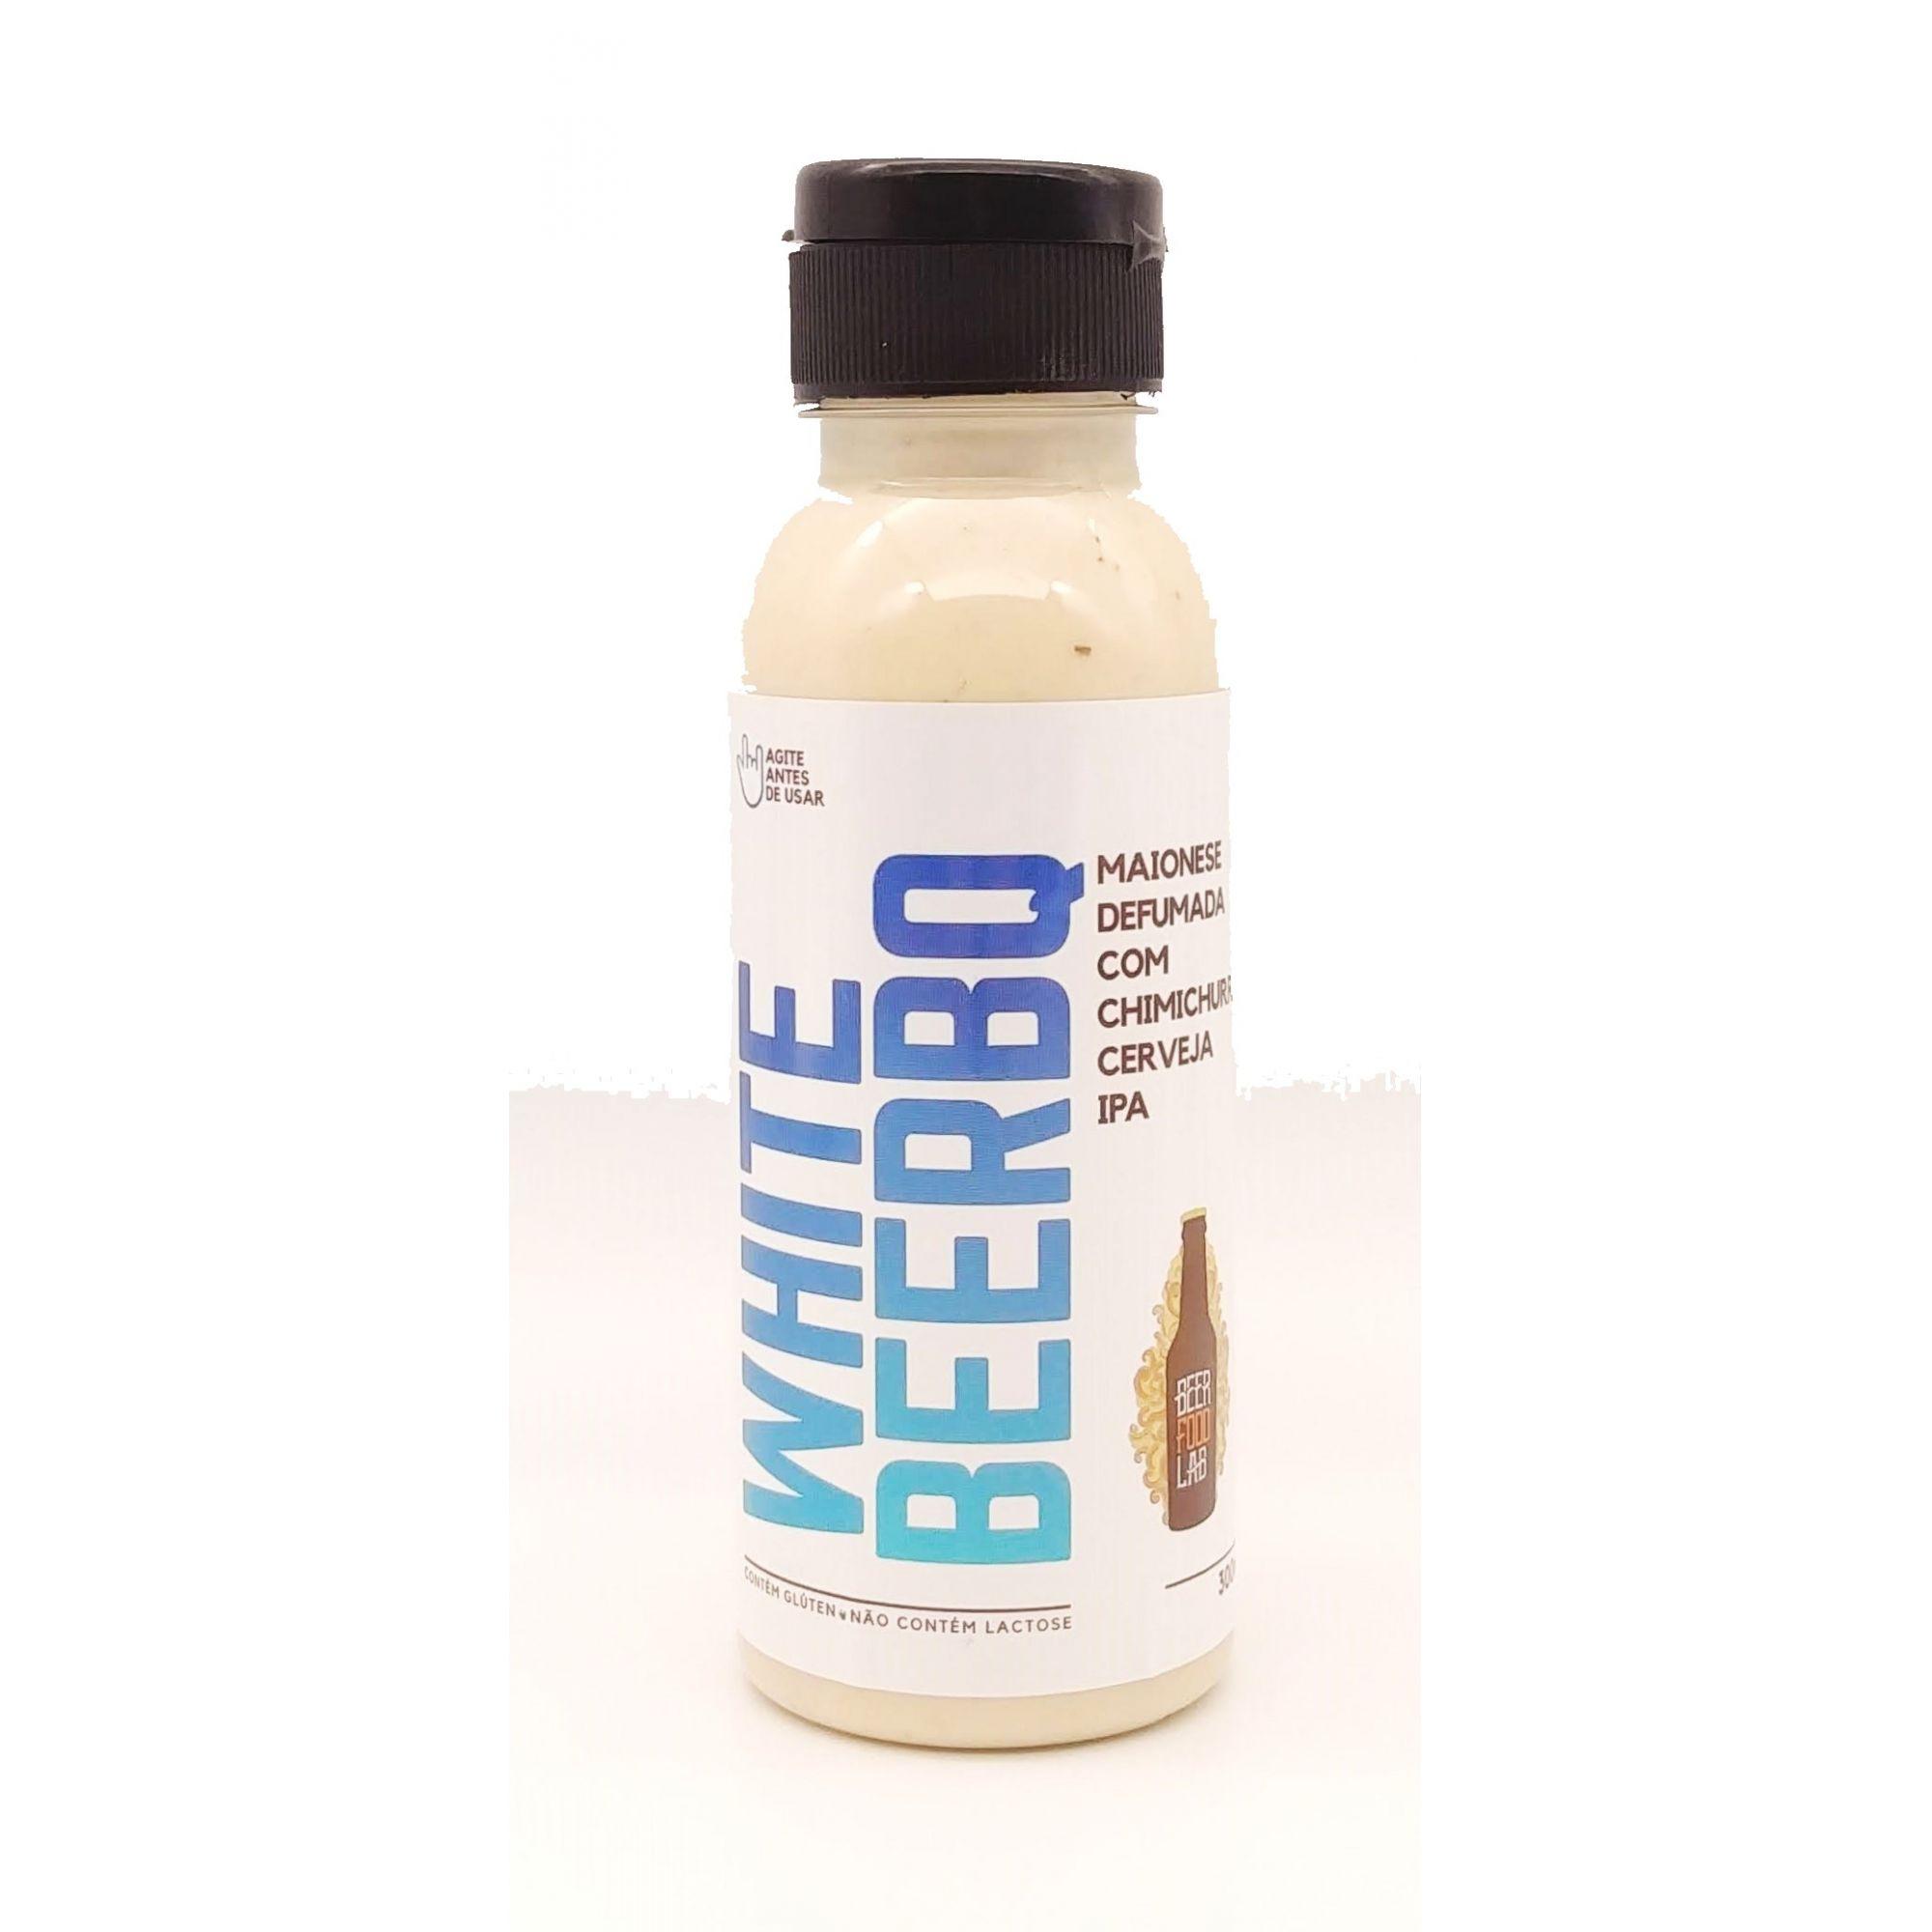 WHITE BEERBQ - Maionese Defumada com Chimichurri e Cerveja Ipa 300ml